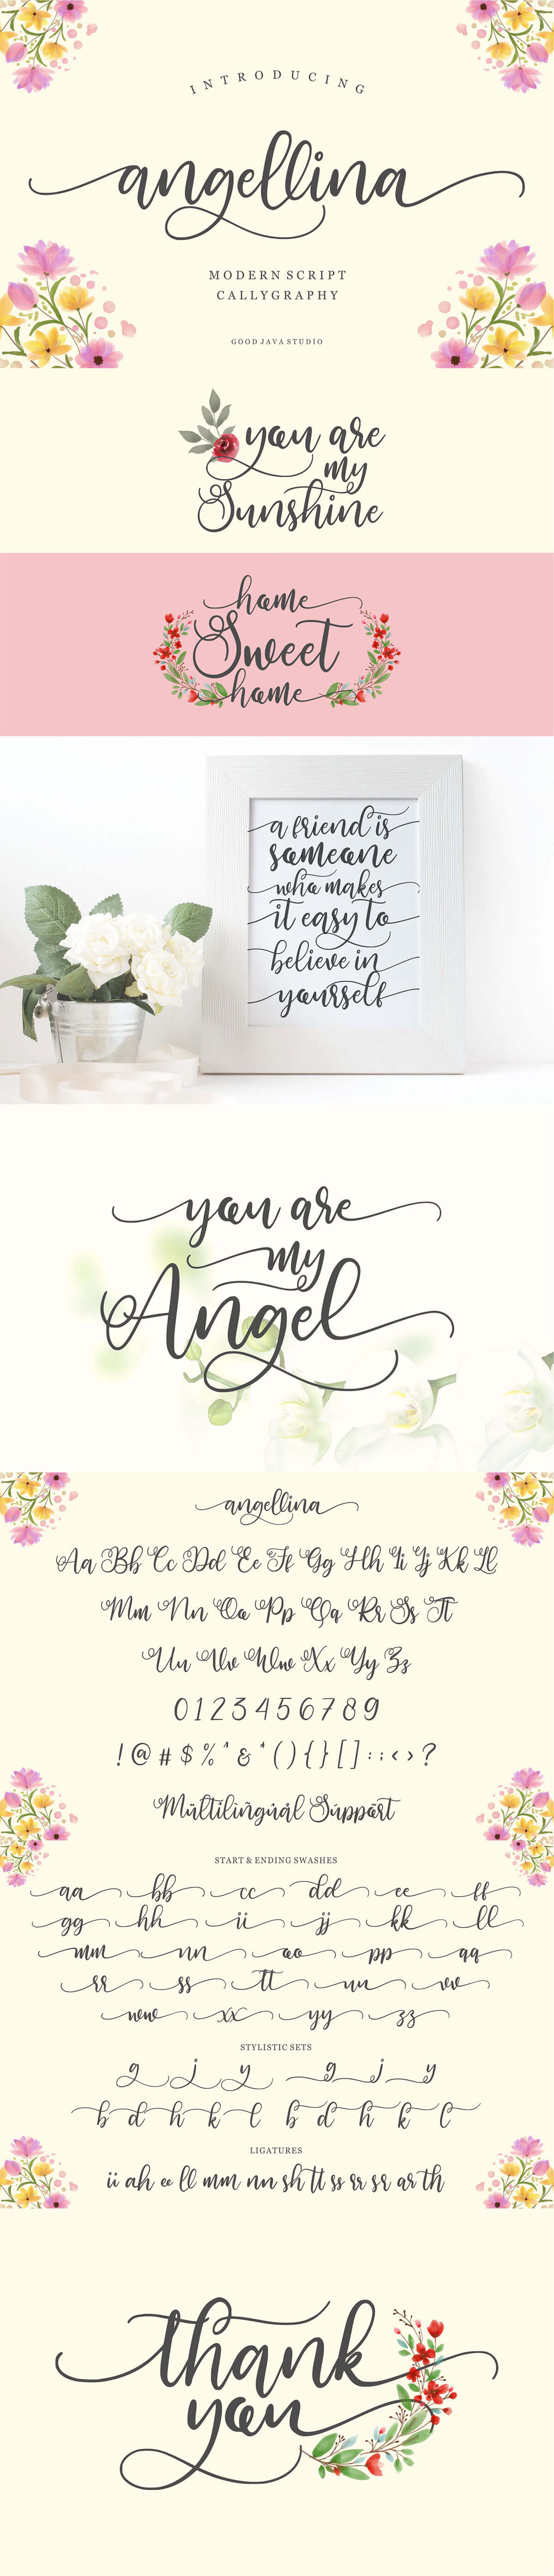 Free Angellina Script Font